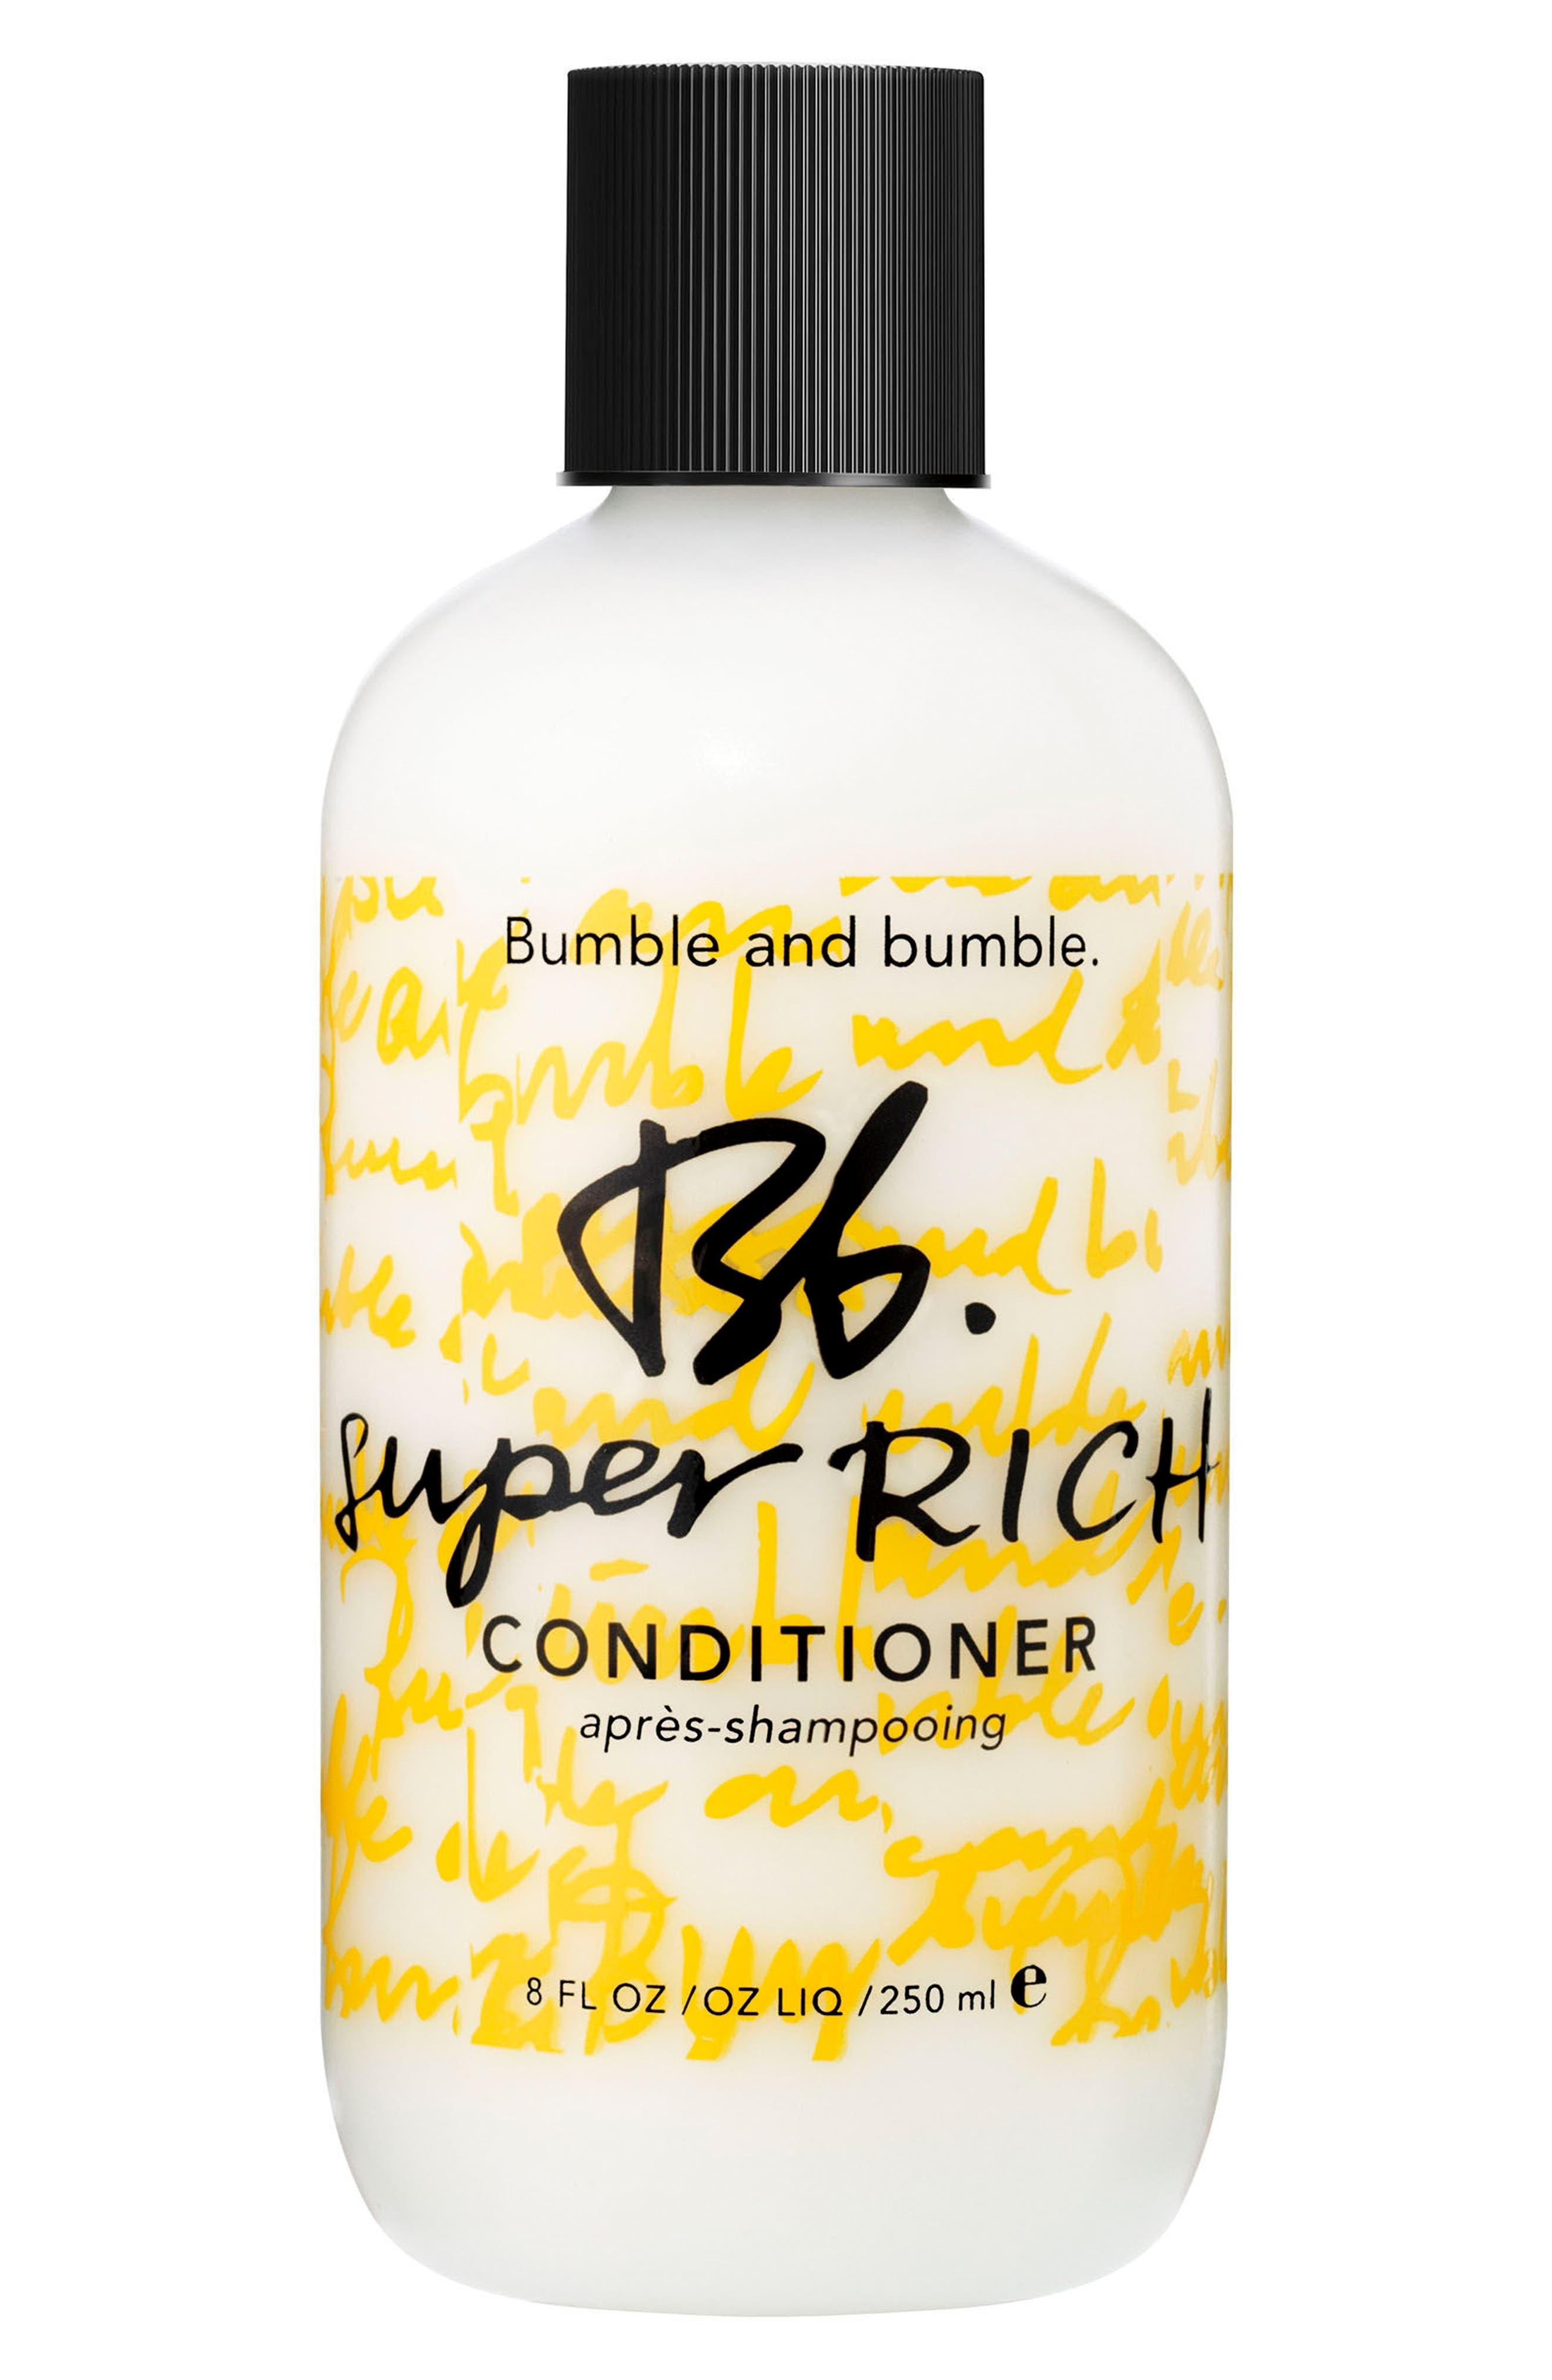 Super Rich Conditioner